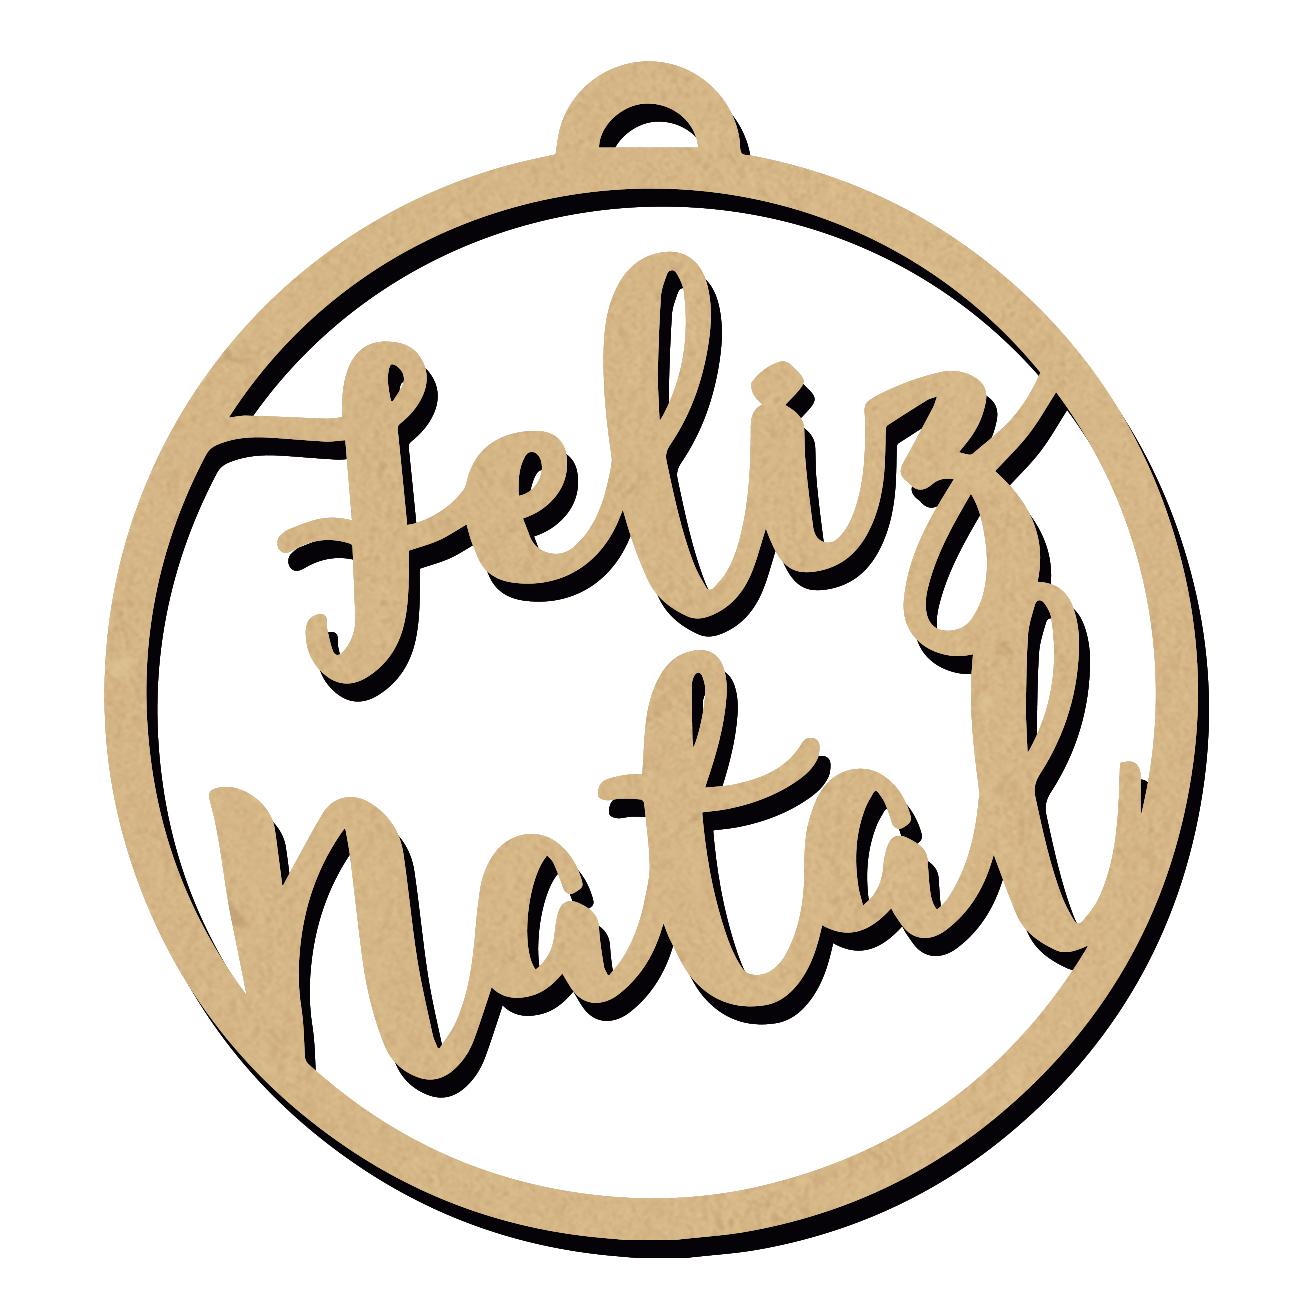 ENFEITE DE NATAL - FELIZ NATAL